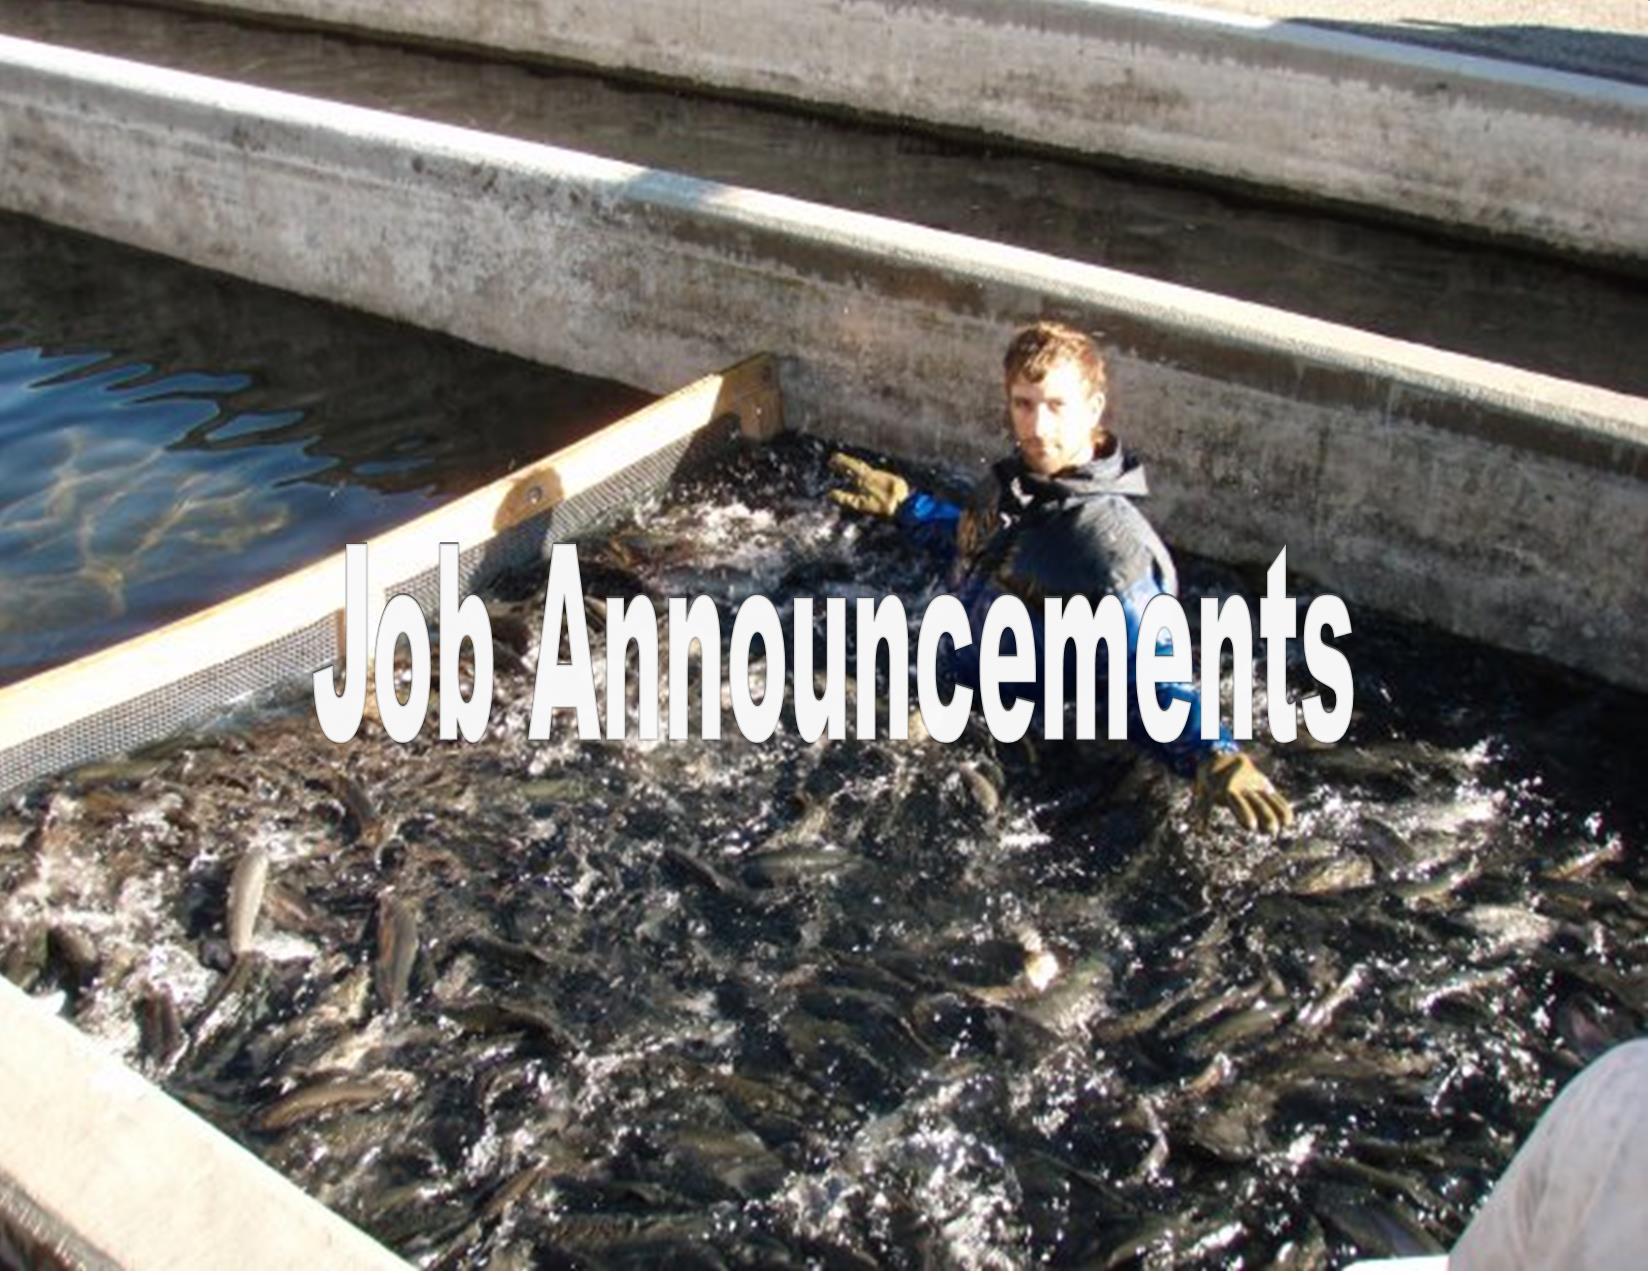 Fish Hatchery Technician, Fish Hatchery Technician, Kyle Okeson, Division of Wildlife, Jason Fearheiley, Colorado Parks and Wildlife, 10/15/2008